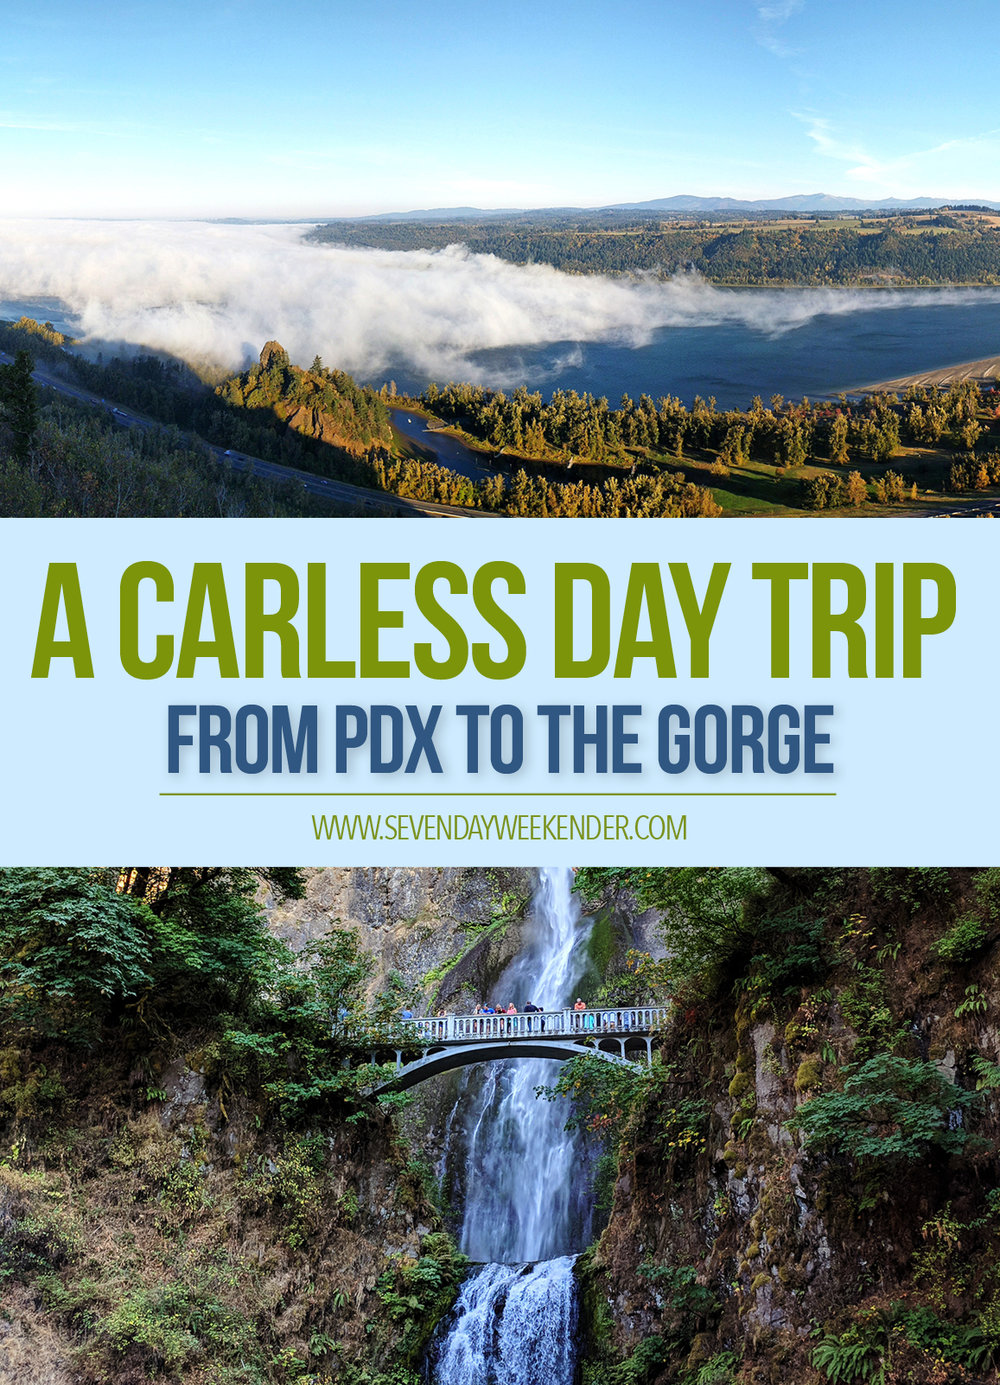 Columbia River Gorge Carless Day Trip